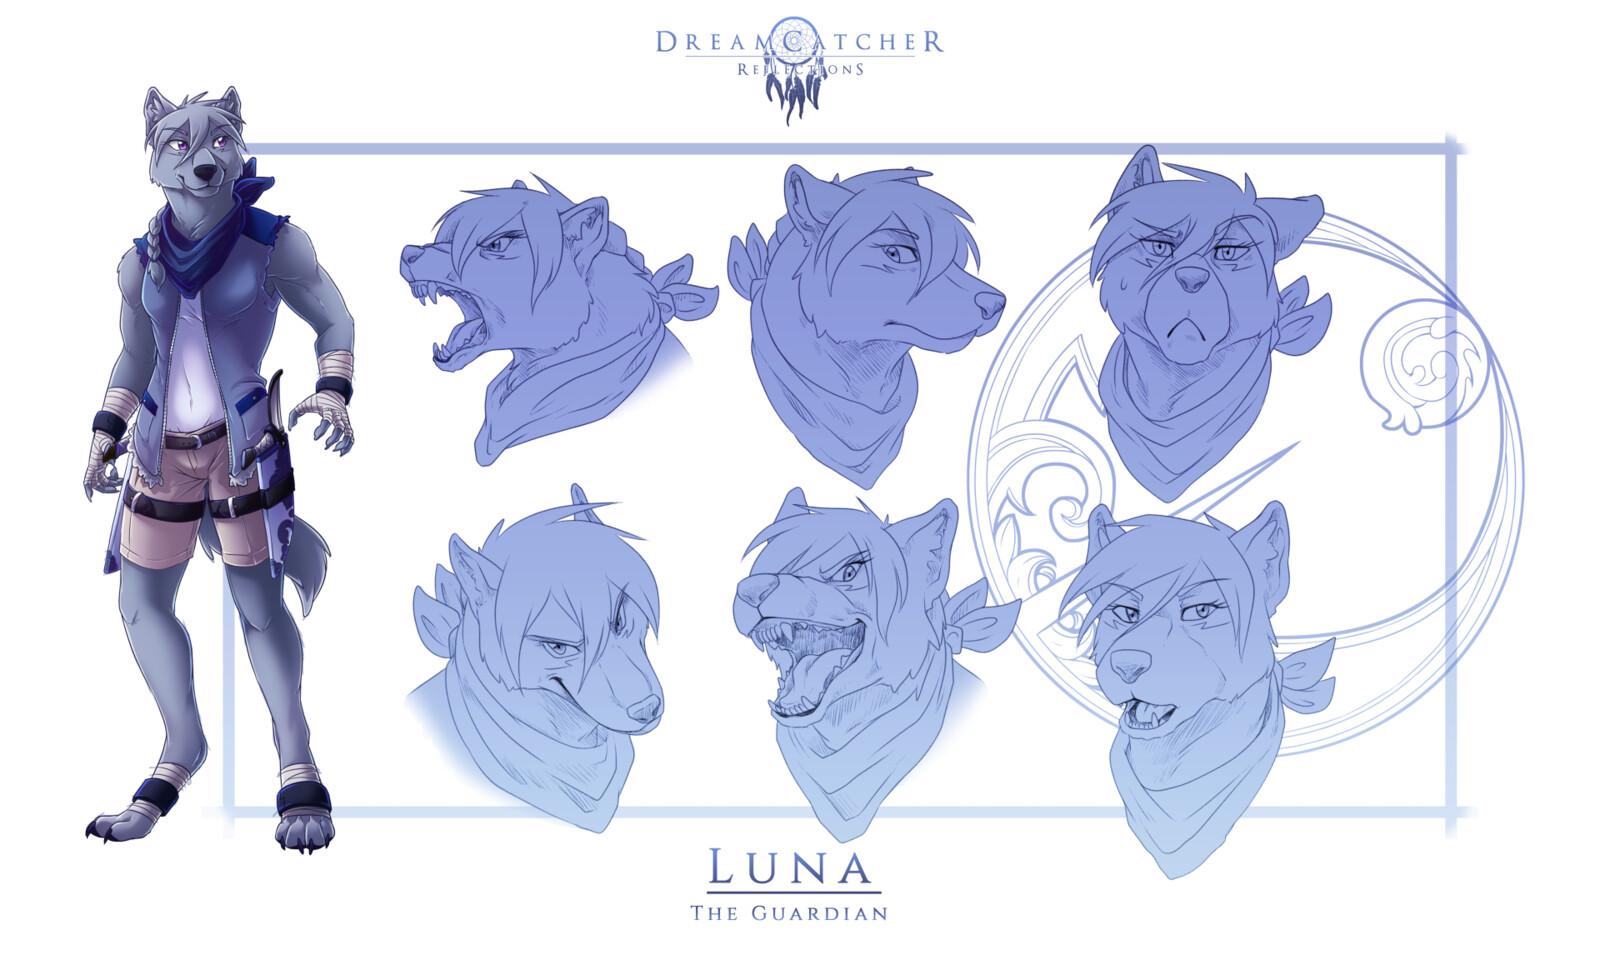 DreamCatcher: Reflections - Luna Ref